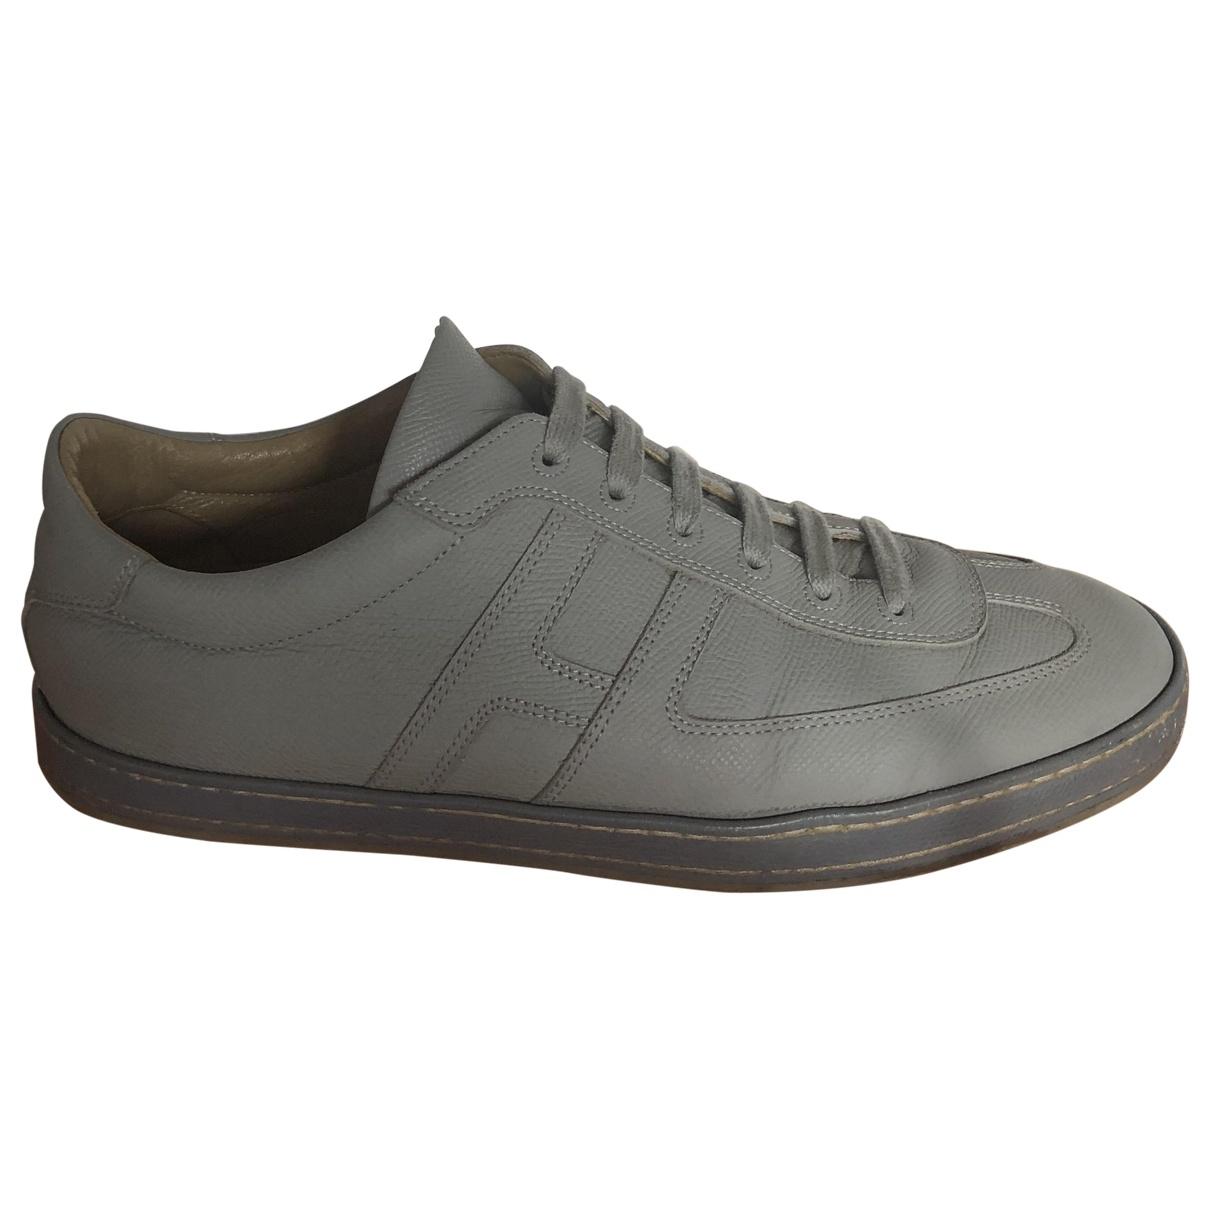 Hermès \N Grey Leather Trainers for Men 42 EU